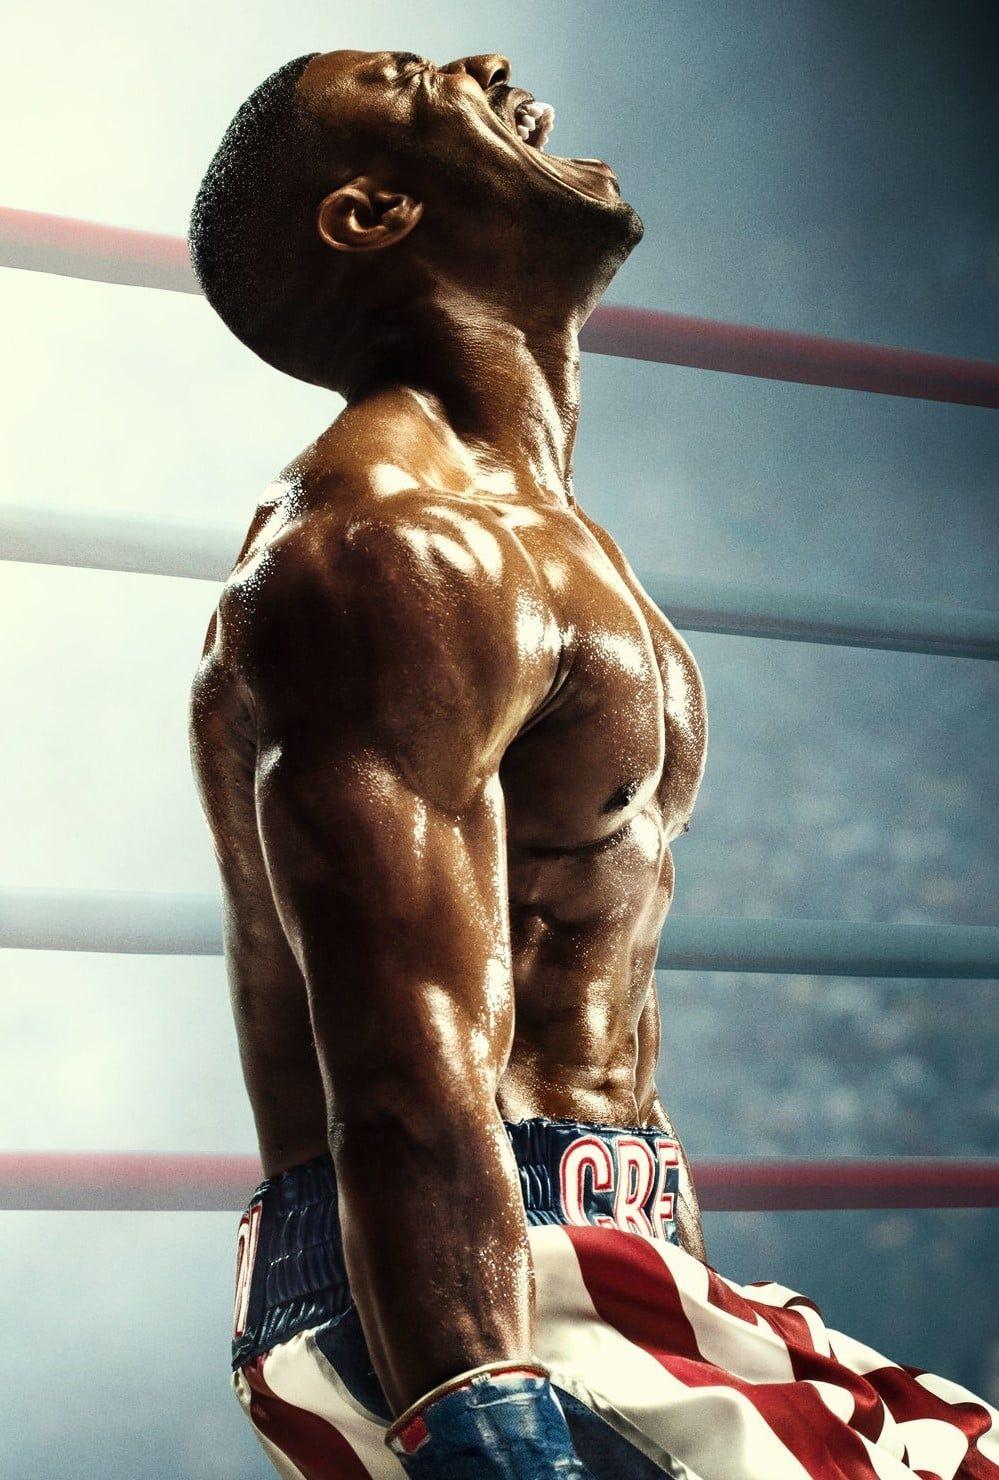 Creed 2 Streaming Vostfr : creed, streaming, vostfr, DOWNLOAD, Creed, FULL, MOVIE, HD1080p, English, Filme, Creed,, Lutador, Boxe,, Pôsteres, Filmes